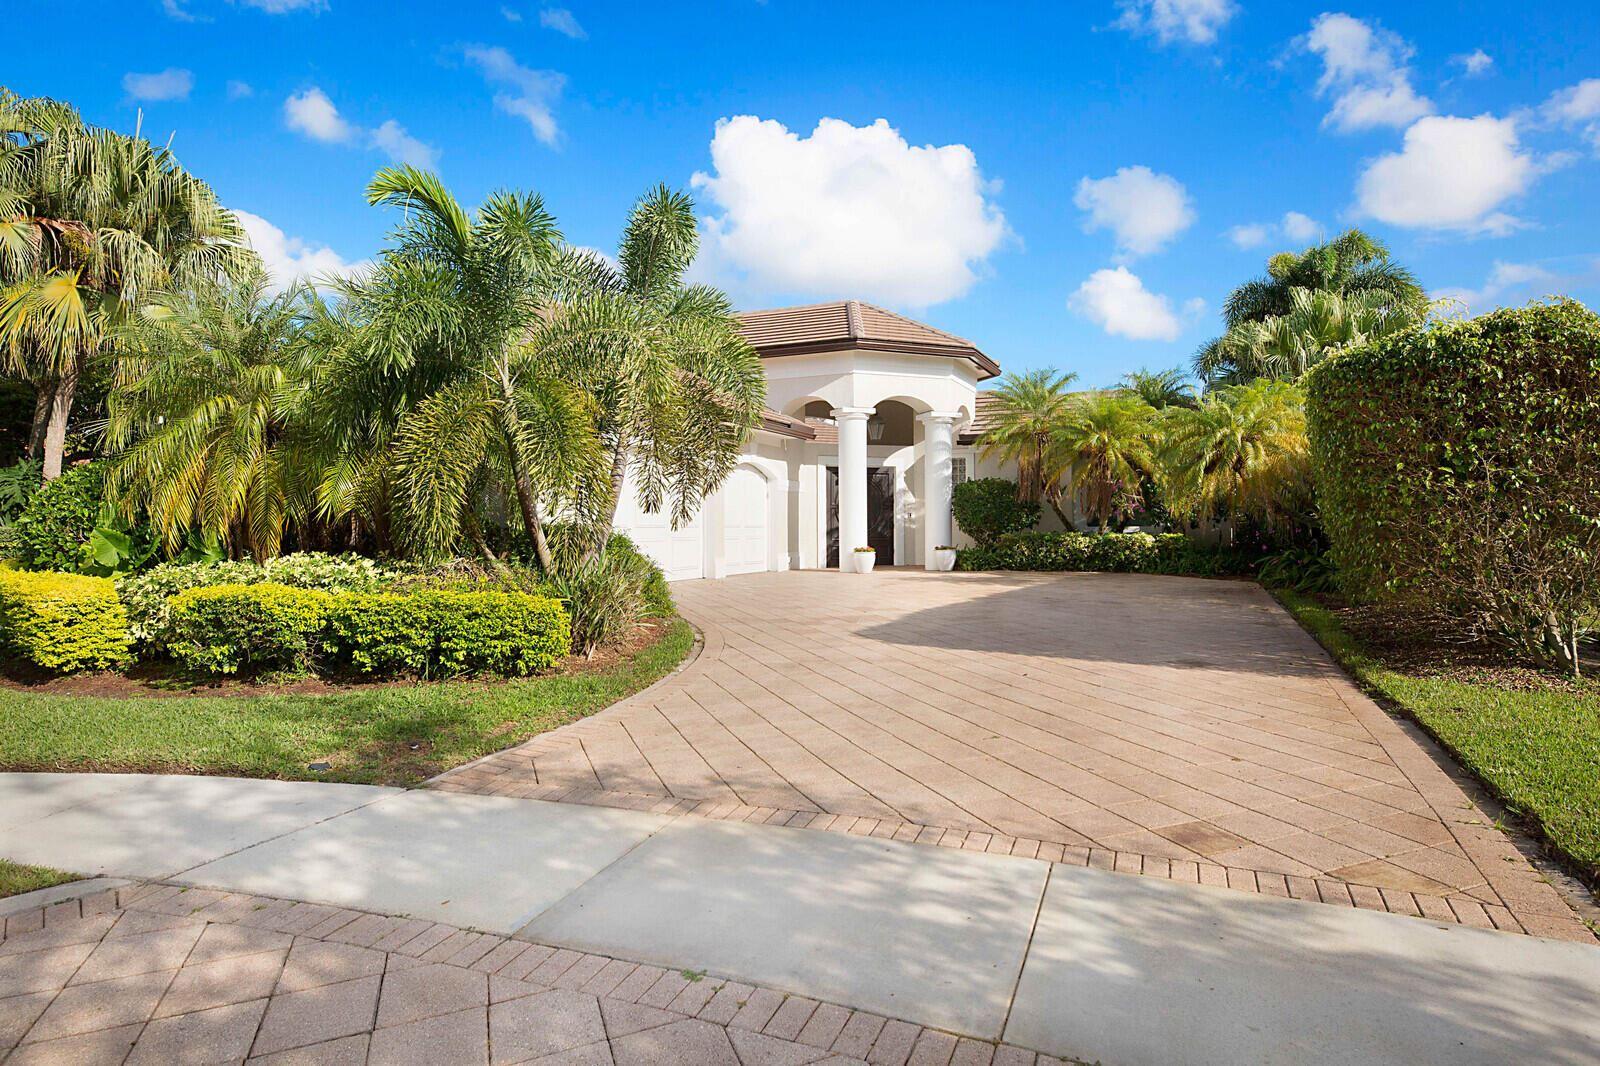 6014 NW 30th Way, Boca Raton, FL 33496 - MLS#: RX-10754312